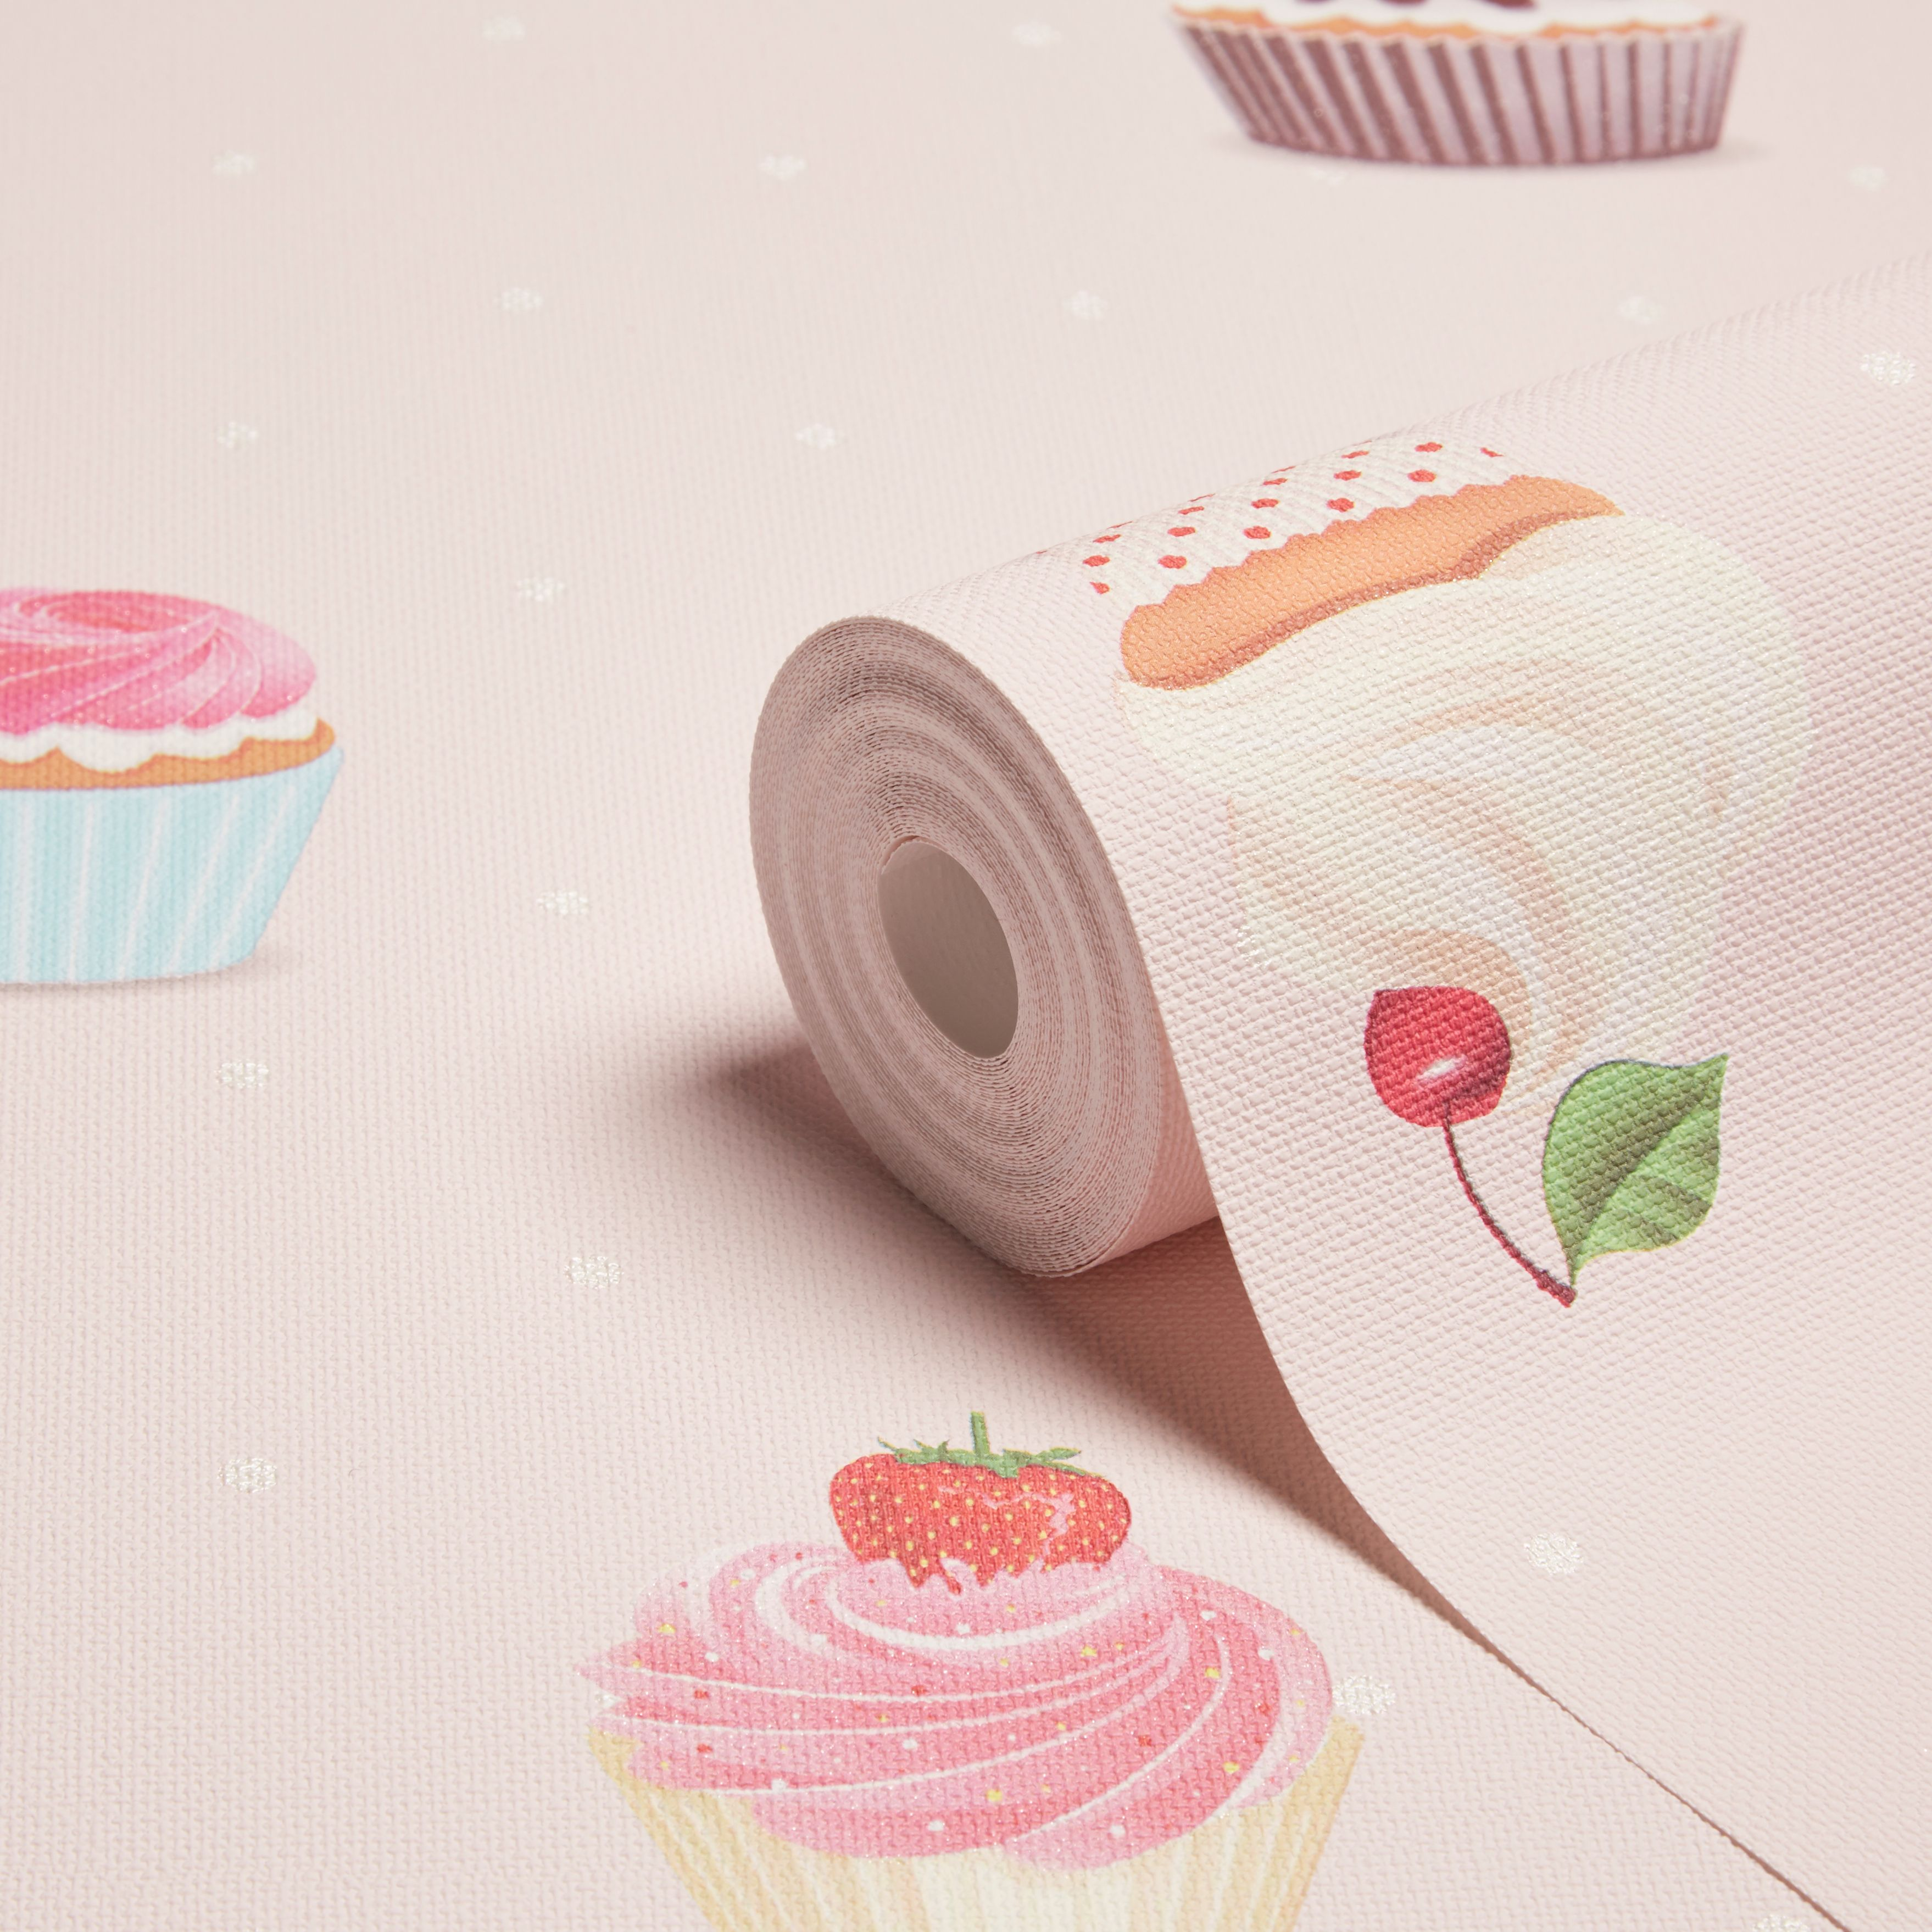 grandeco cupcakes pink cupcakes